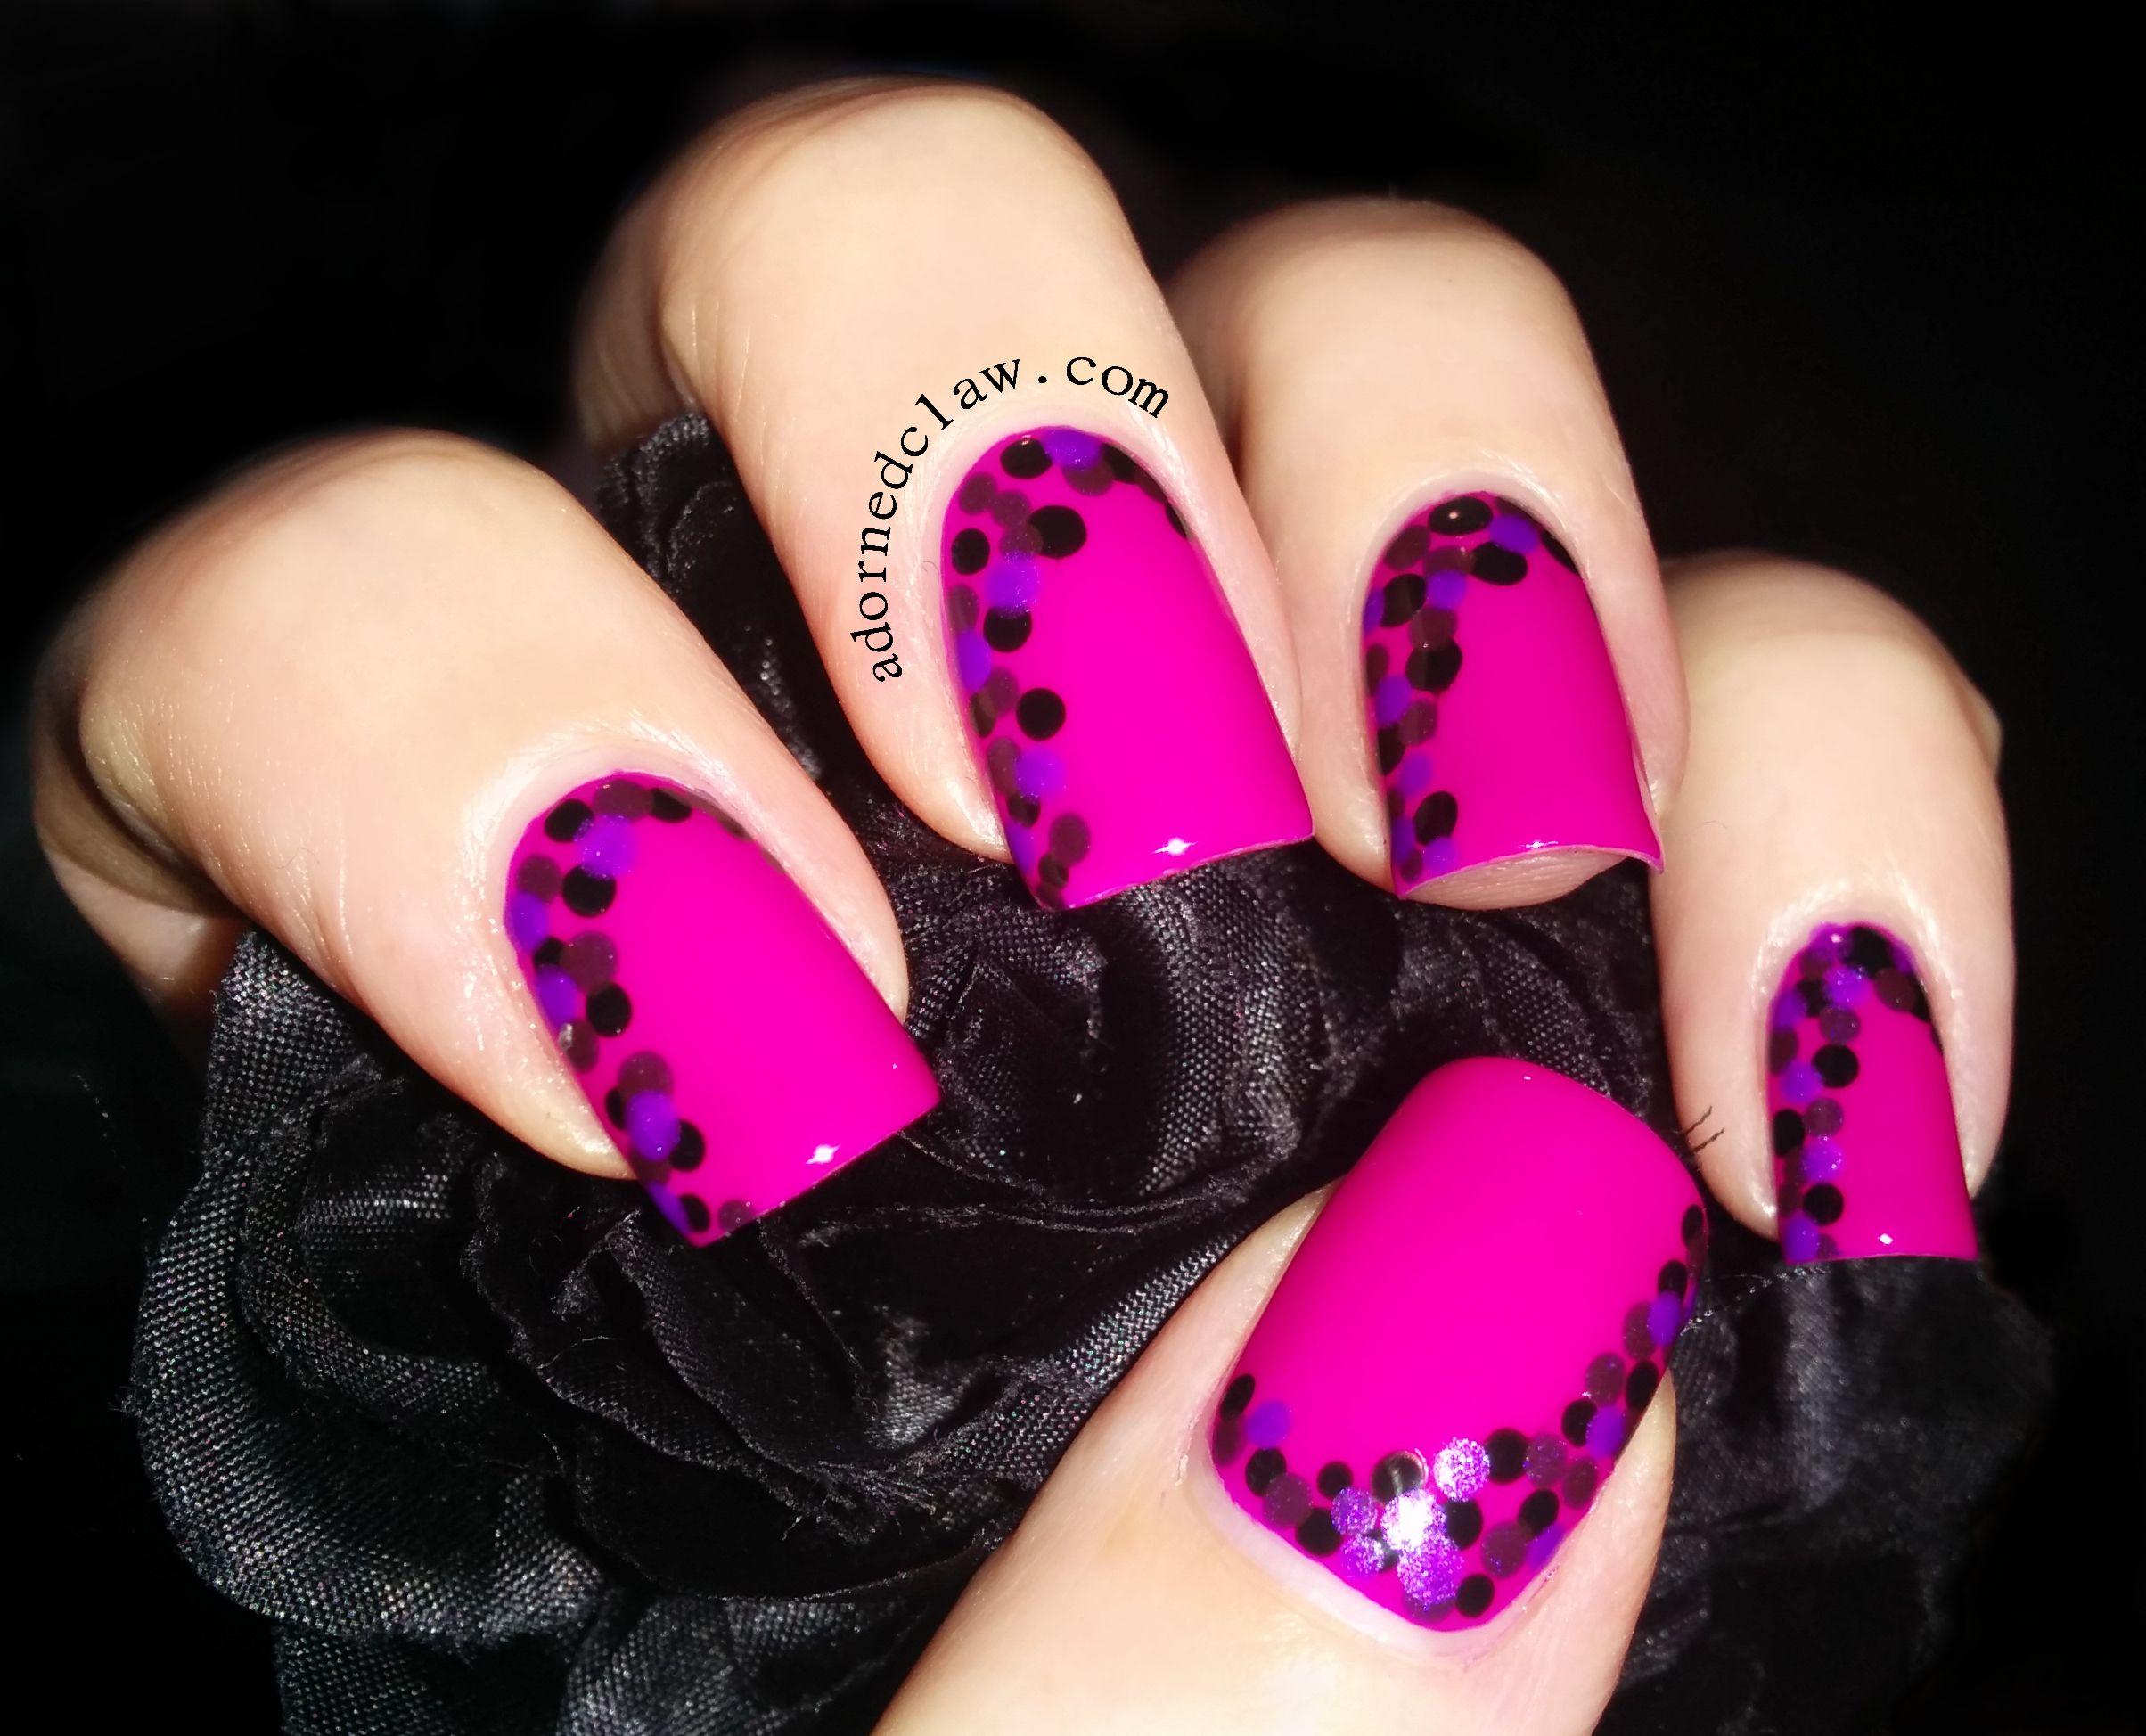 Nail art color violet - Ruby Wing Illamasqua Orly Dots Dotted Nail Art Pink Purple Black Prom Nailed It Pinterest Dot Nail Art